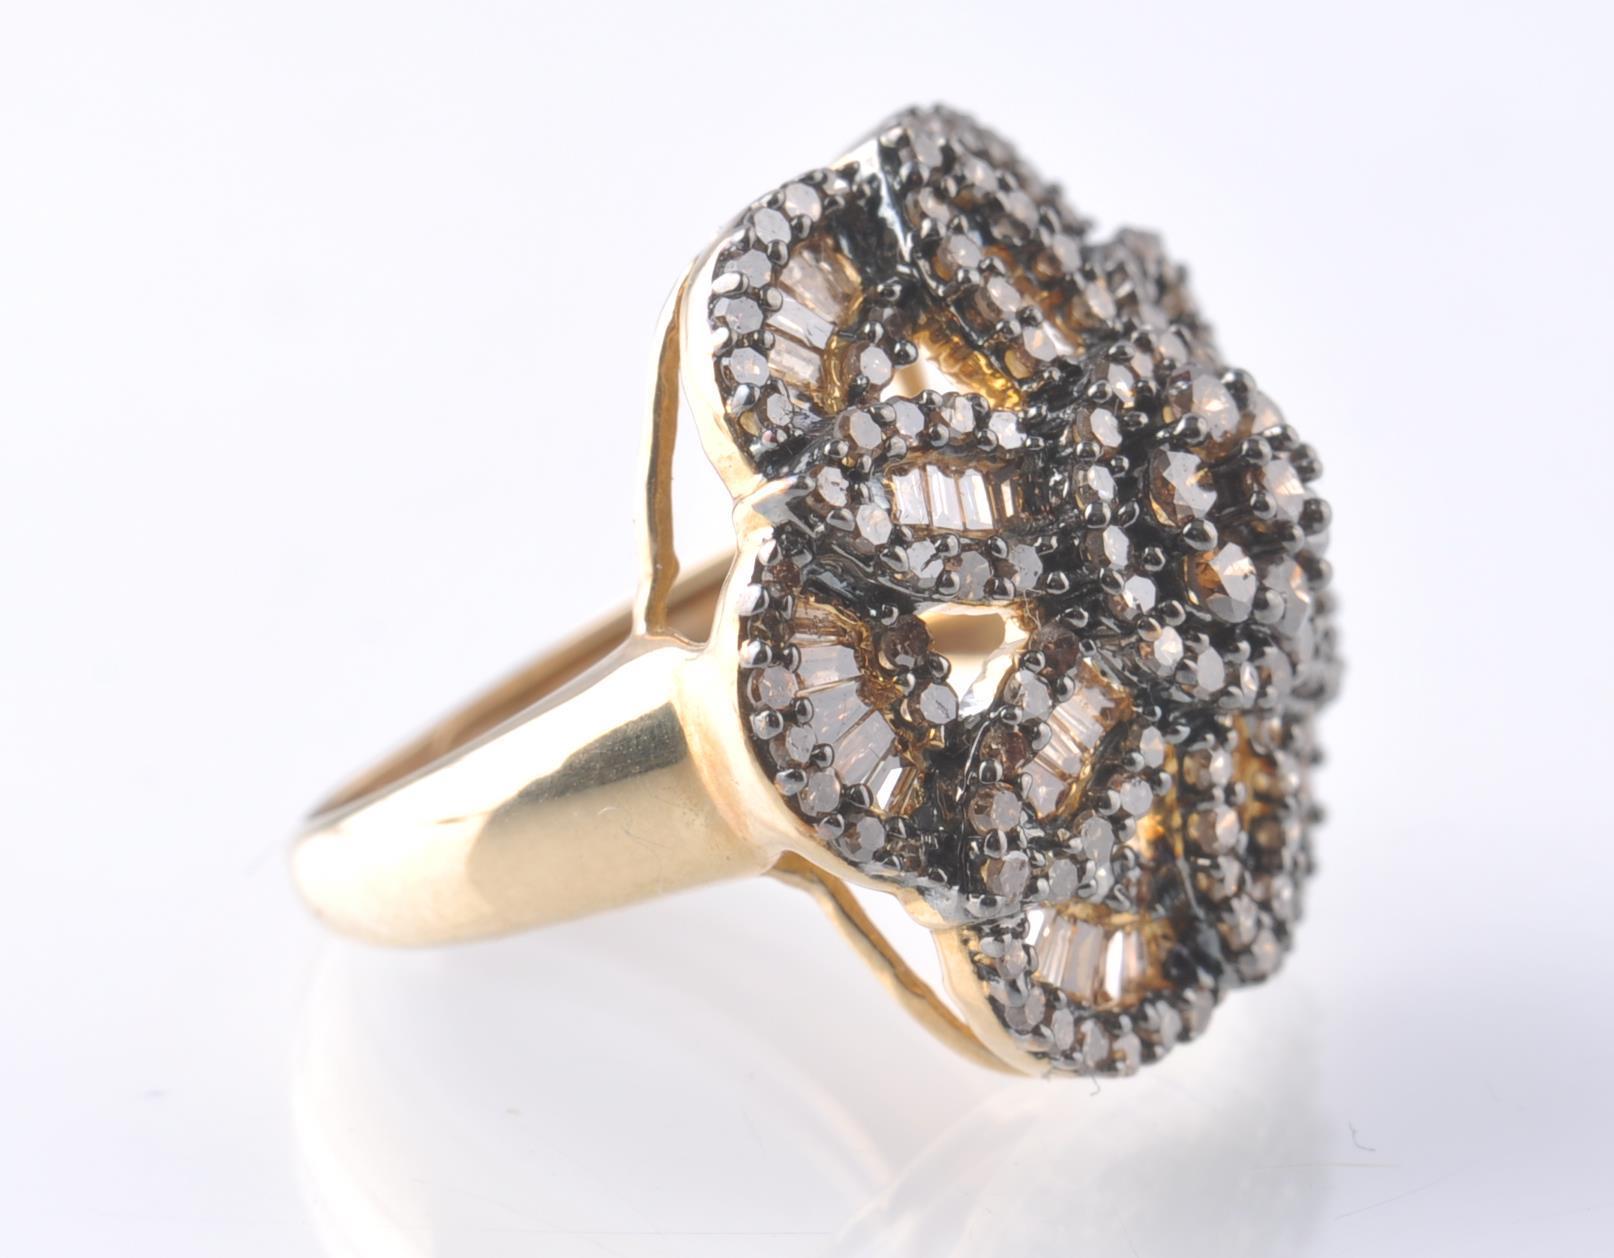 Lot 143 - 9CT GOLD BIRMINGHAM CHAMPAGNE DIAMOND FLOWER CLUST